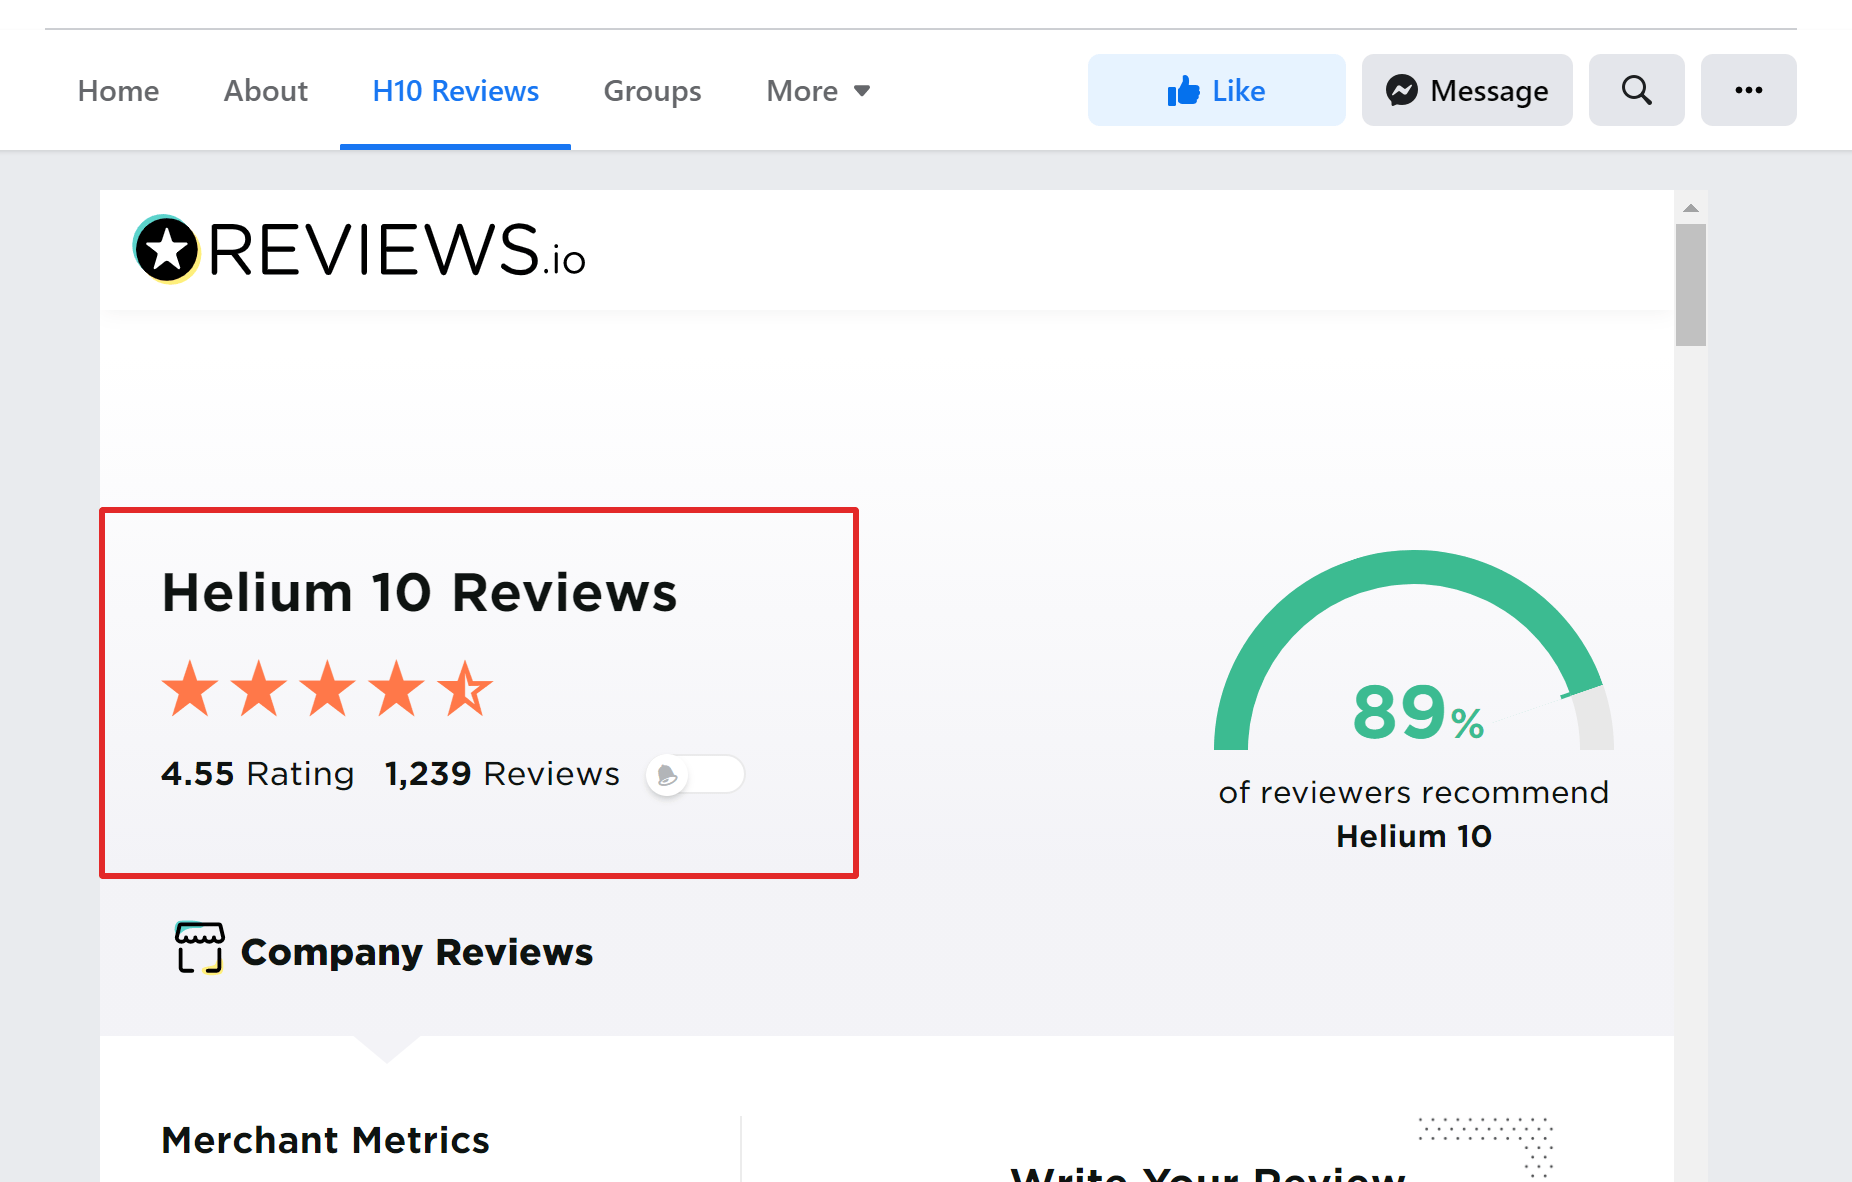 Helium 10 amazon fba software reviews